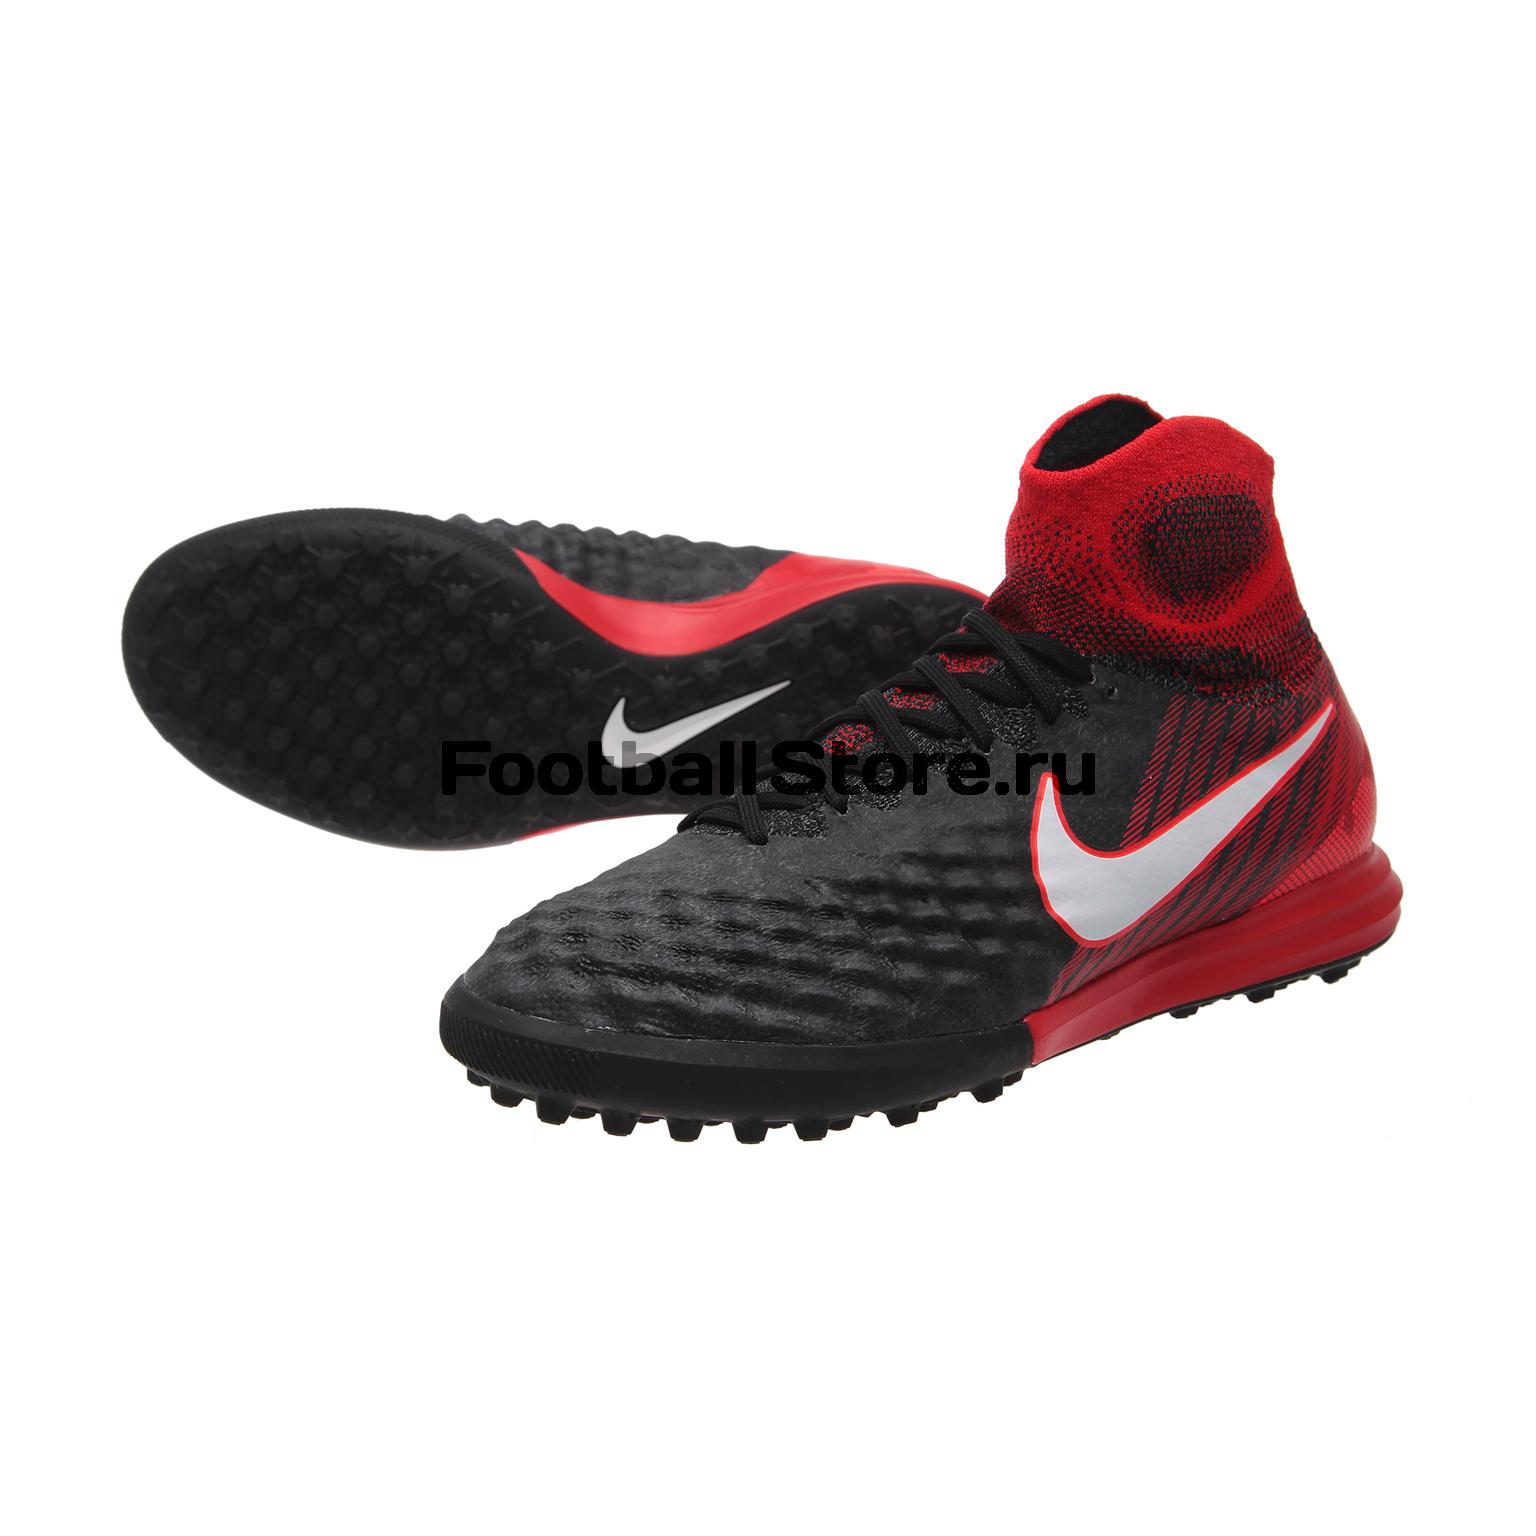 Шиповки детские Nike MagistaX Proximo II DF TF 843956-061 шиповки nike lunar legendx 7 pro tf ah7249 080